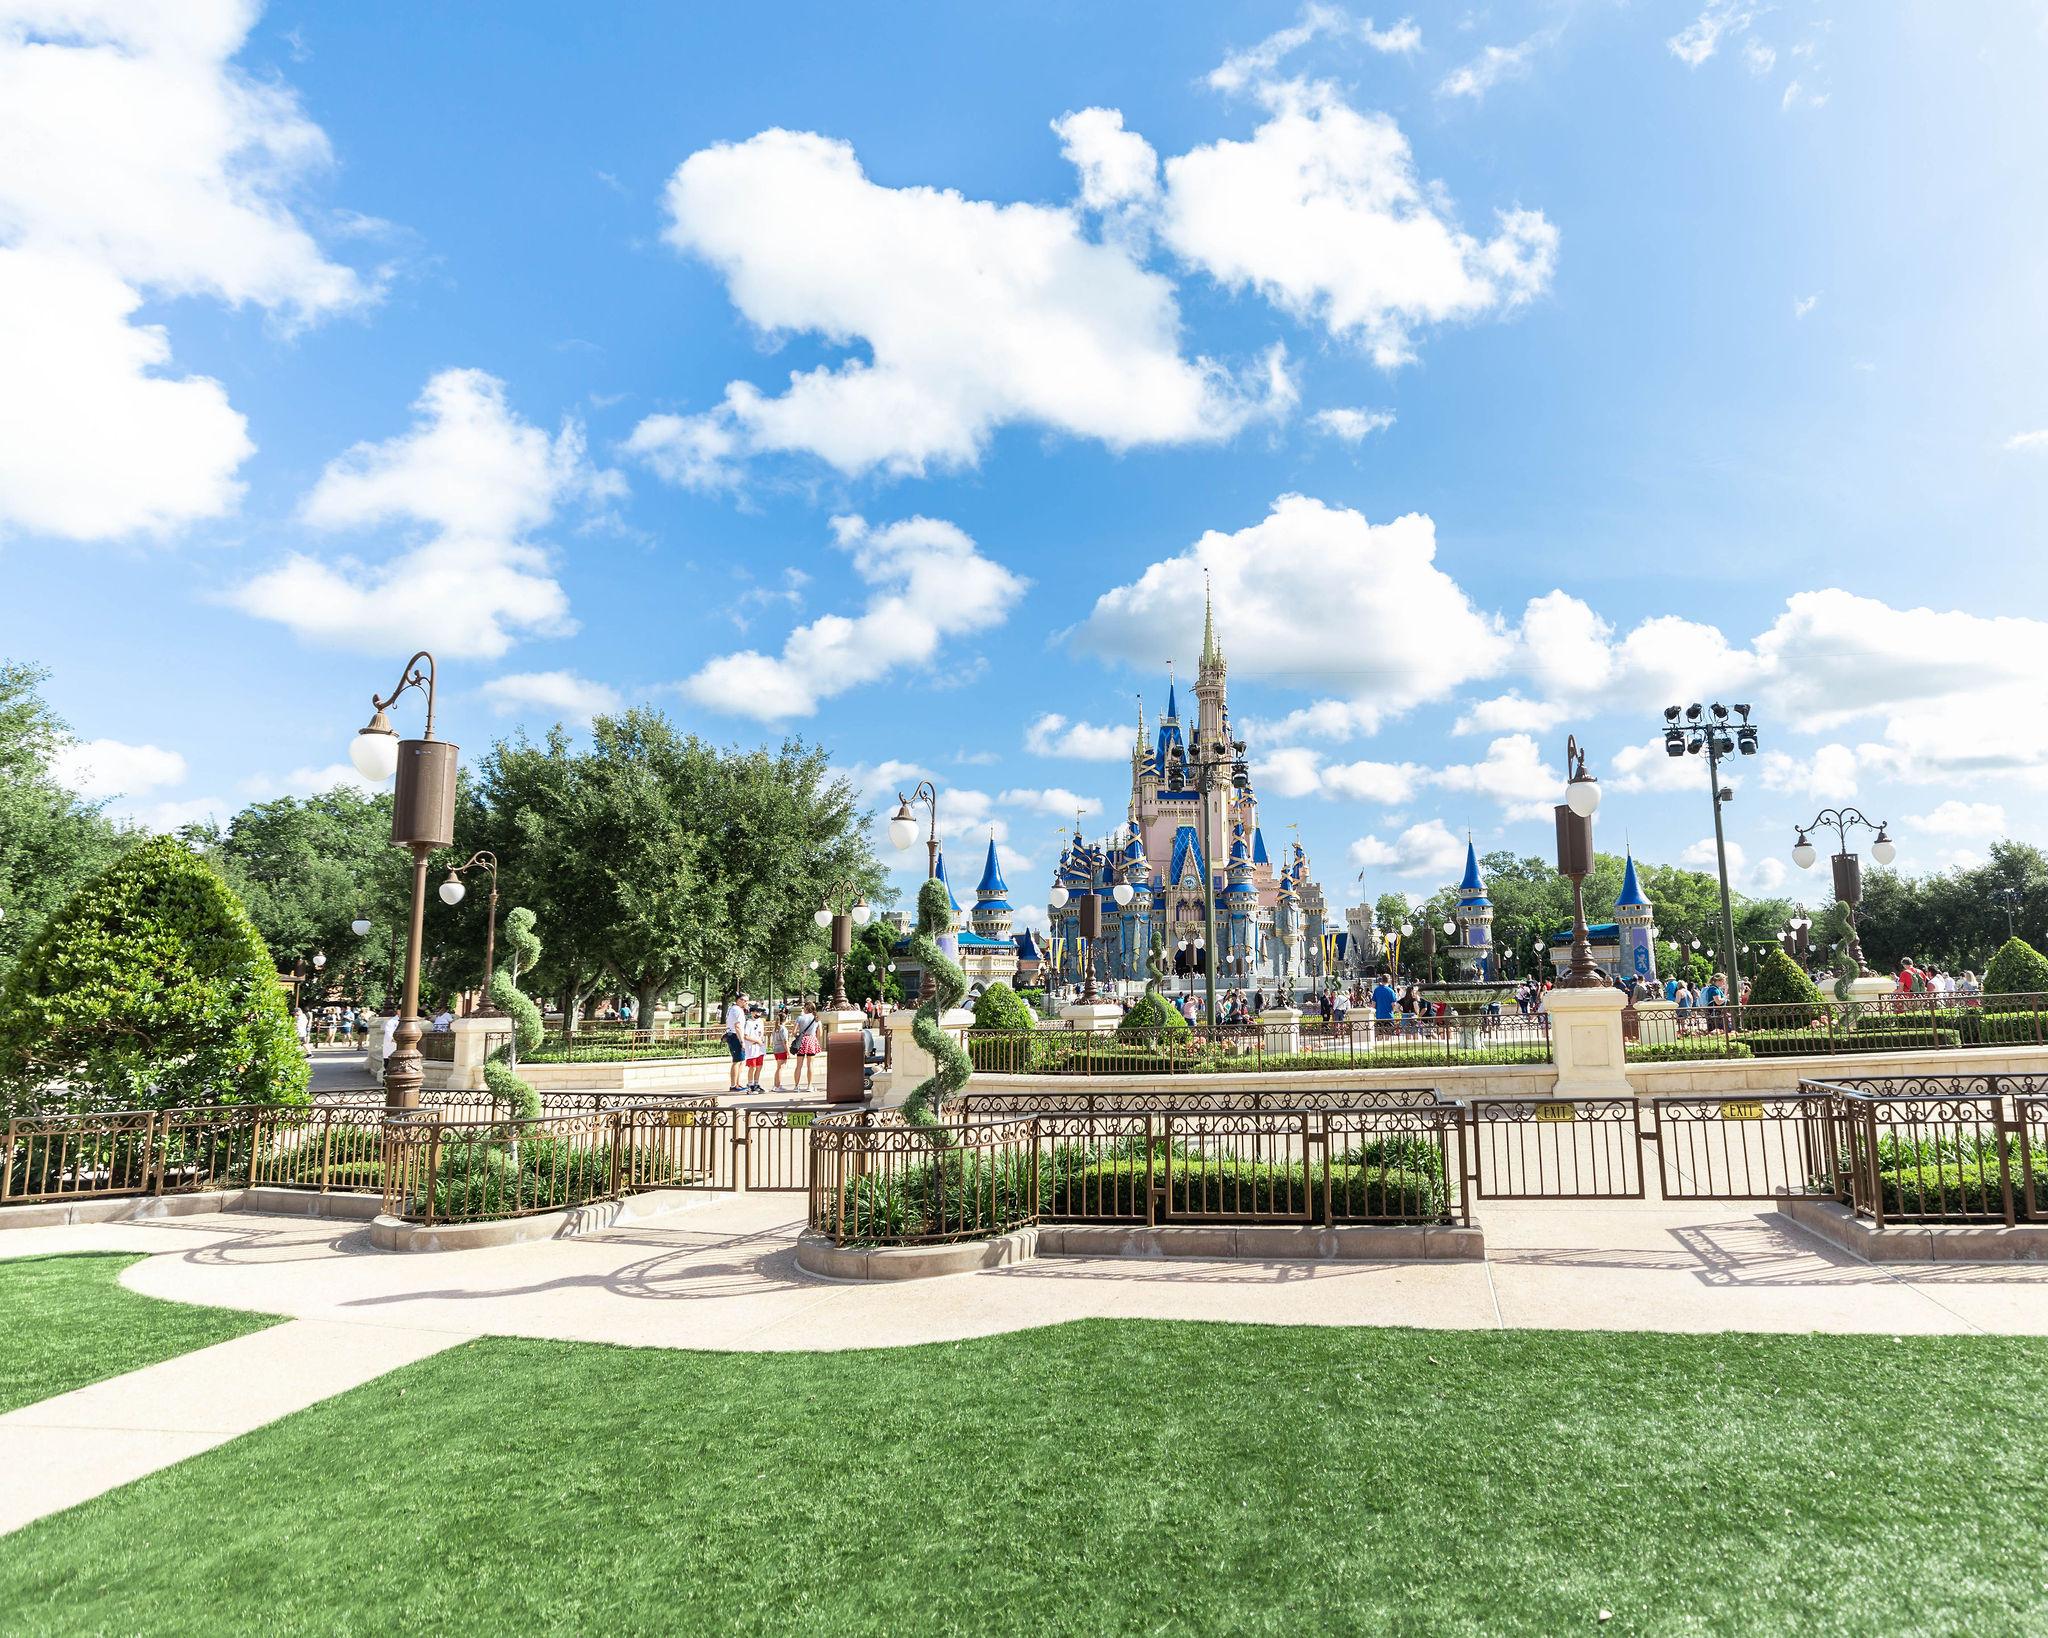 Walt Disney World Magic Kingdom Cinderella Castle & Hub Grass Photographed by Luxury Travel Writer Annie Fairfax